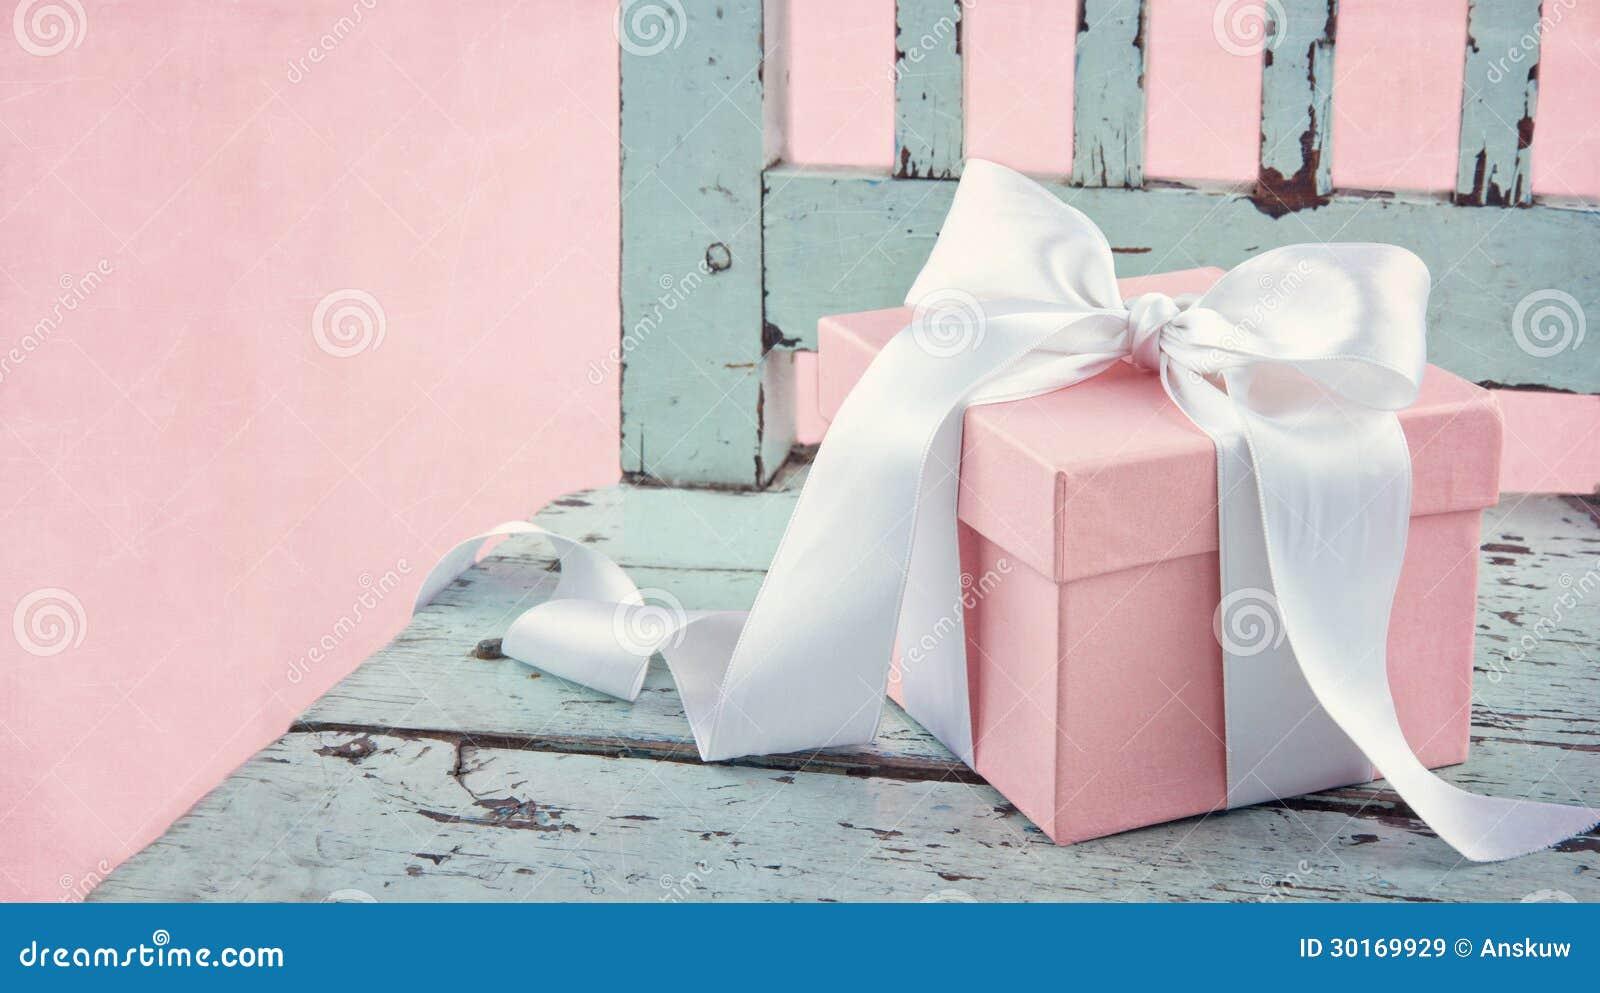 Licht Roze Stoel : Woonkamer licht roze wat een meisje wil een mooie slaapkamer